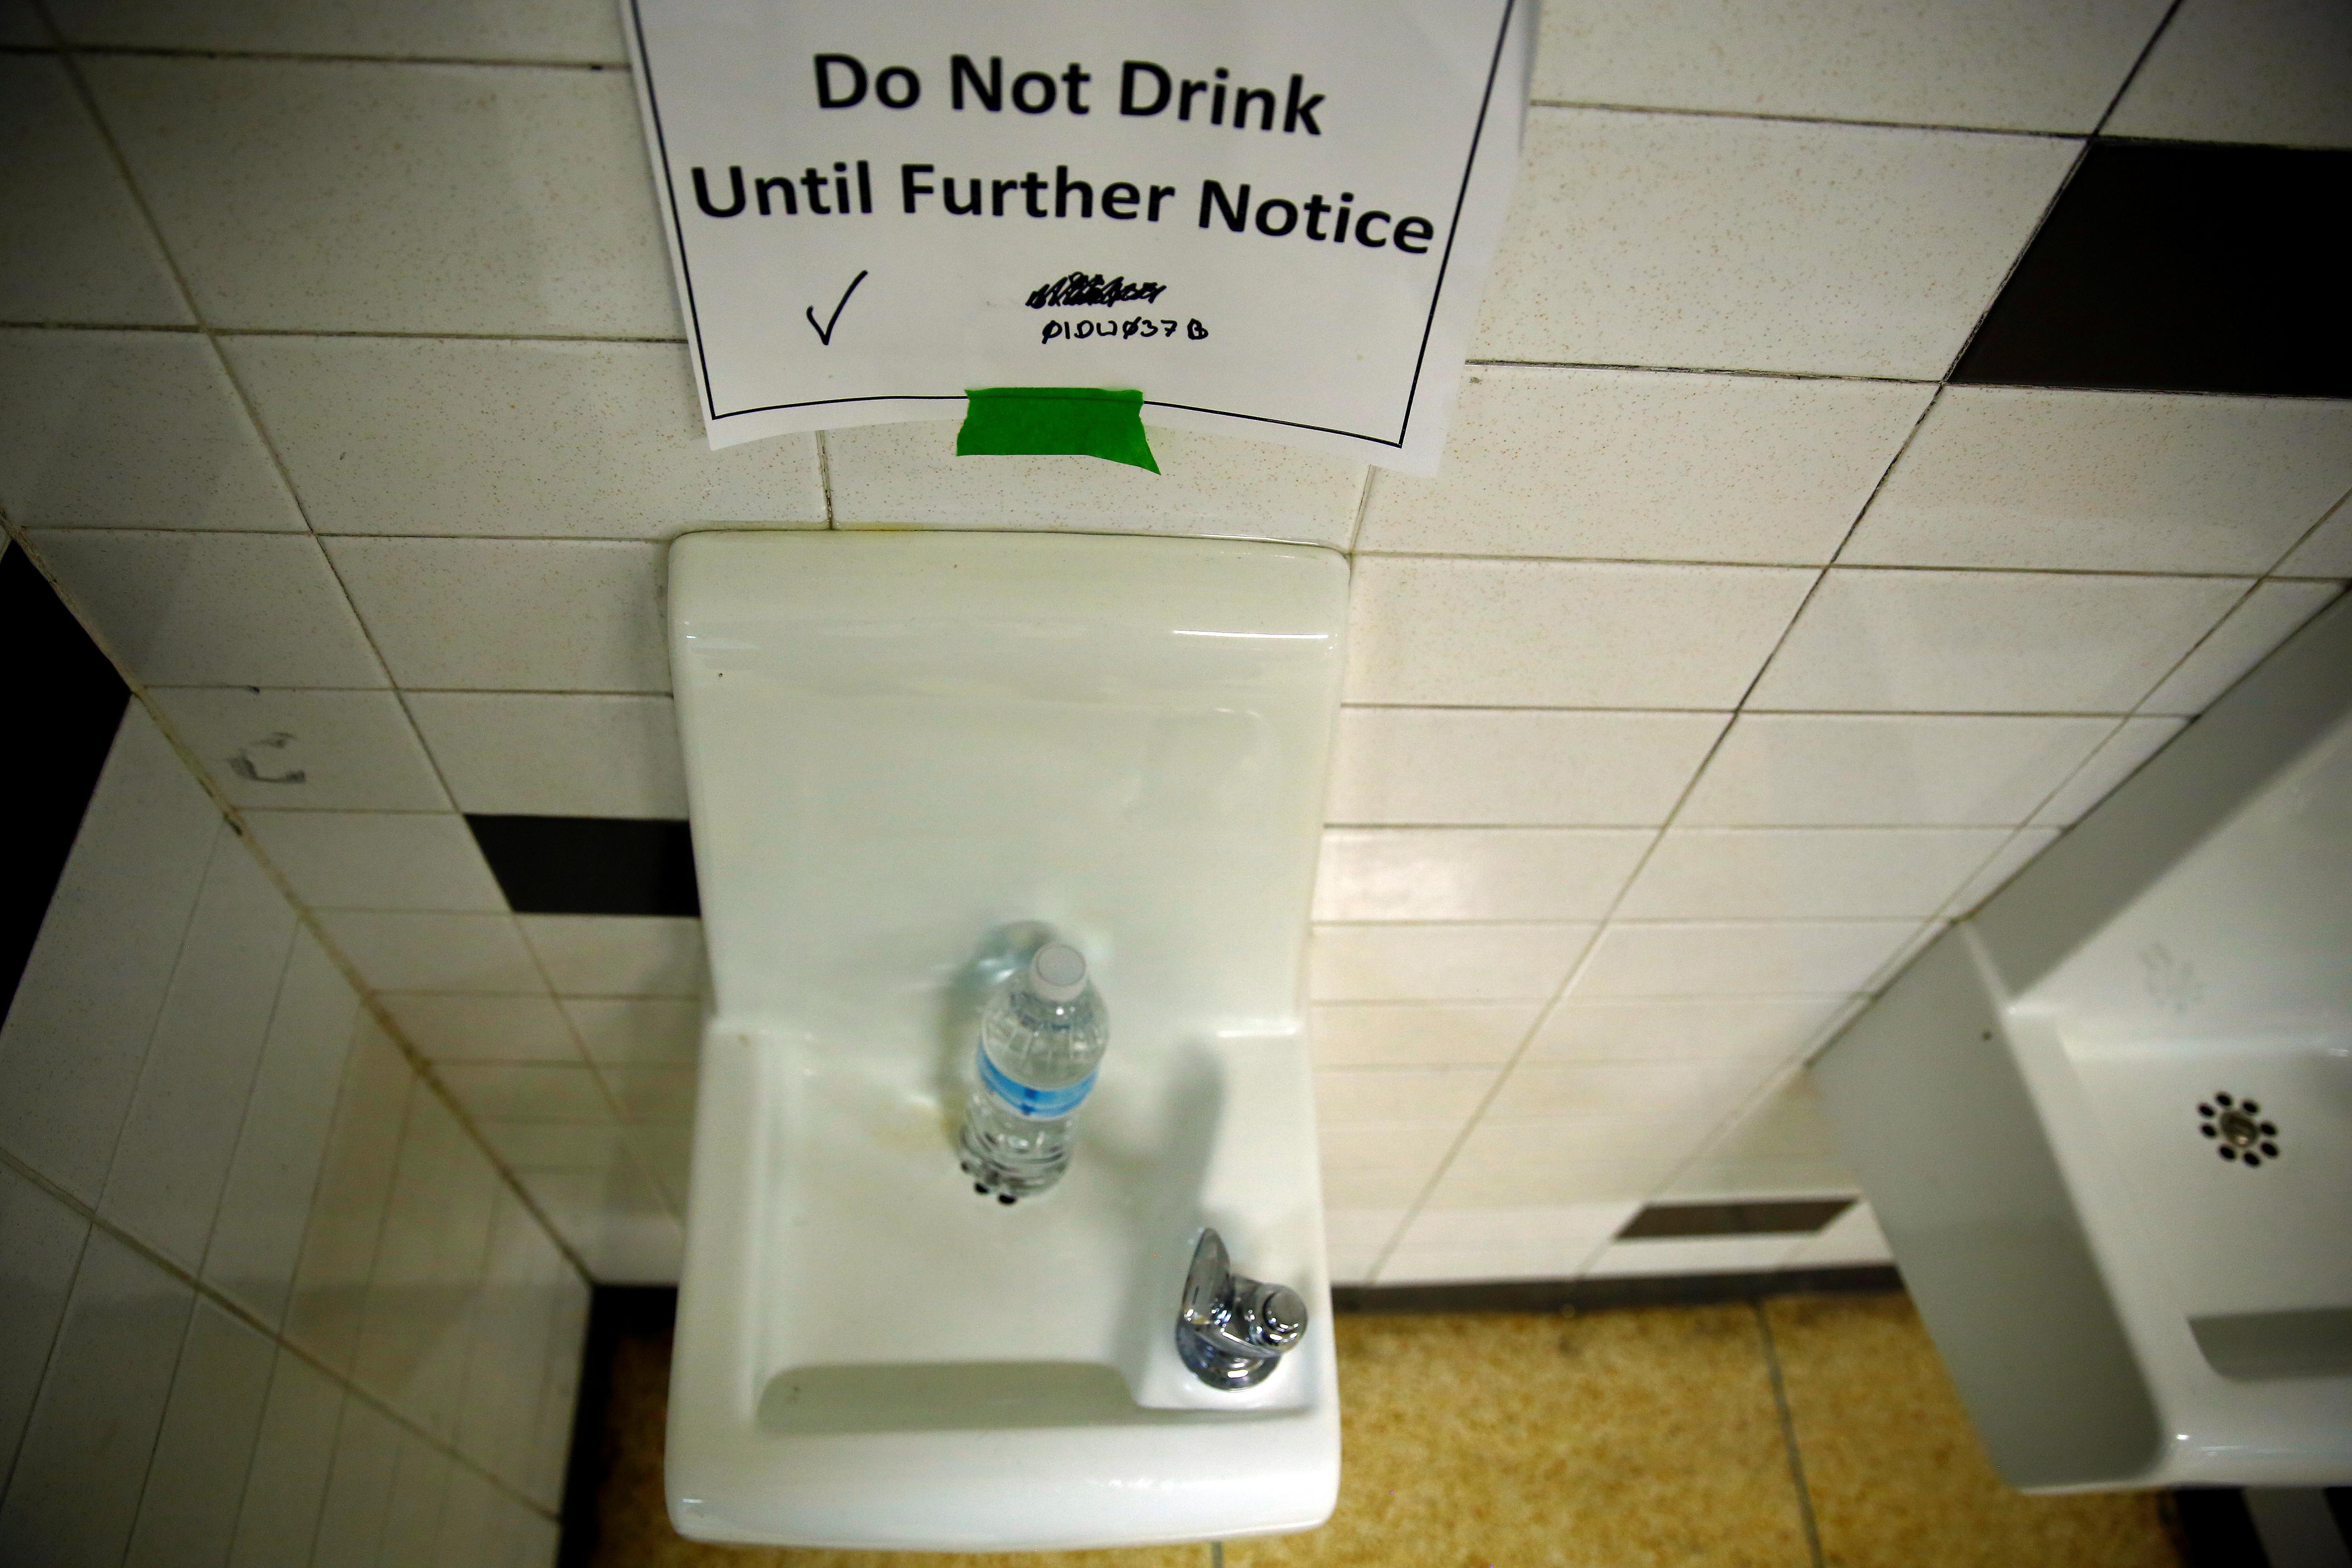 A sign is seen next to a water dispenser at a high school in Flint